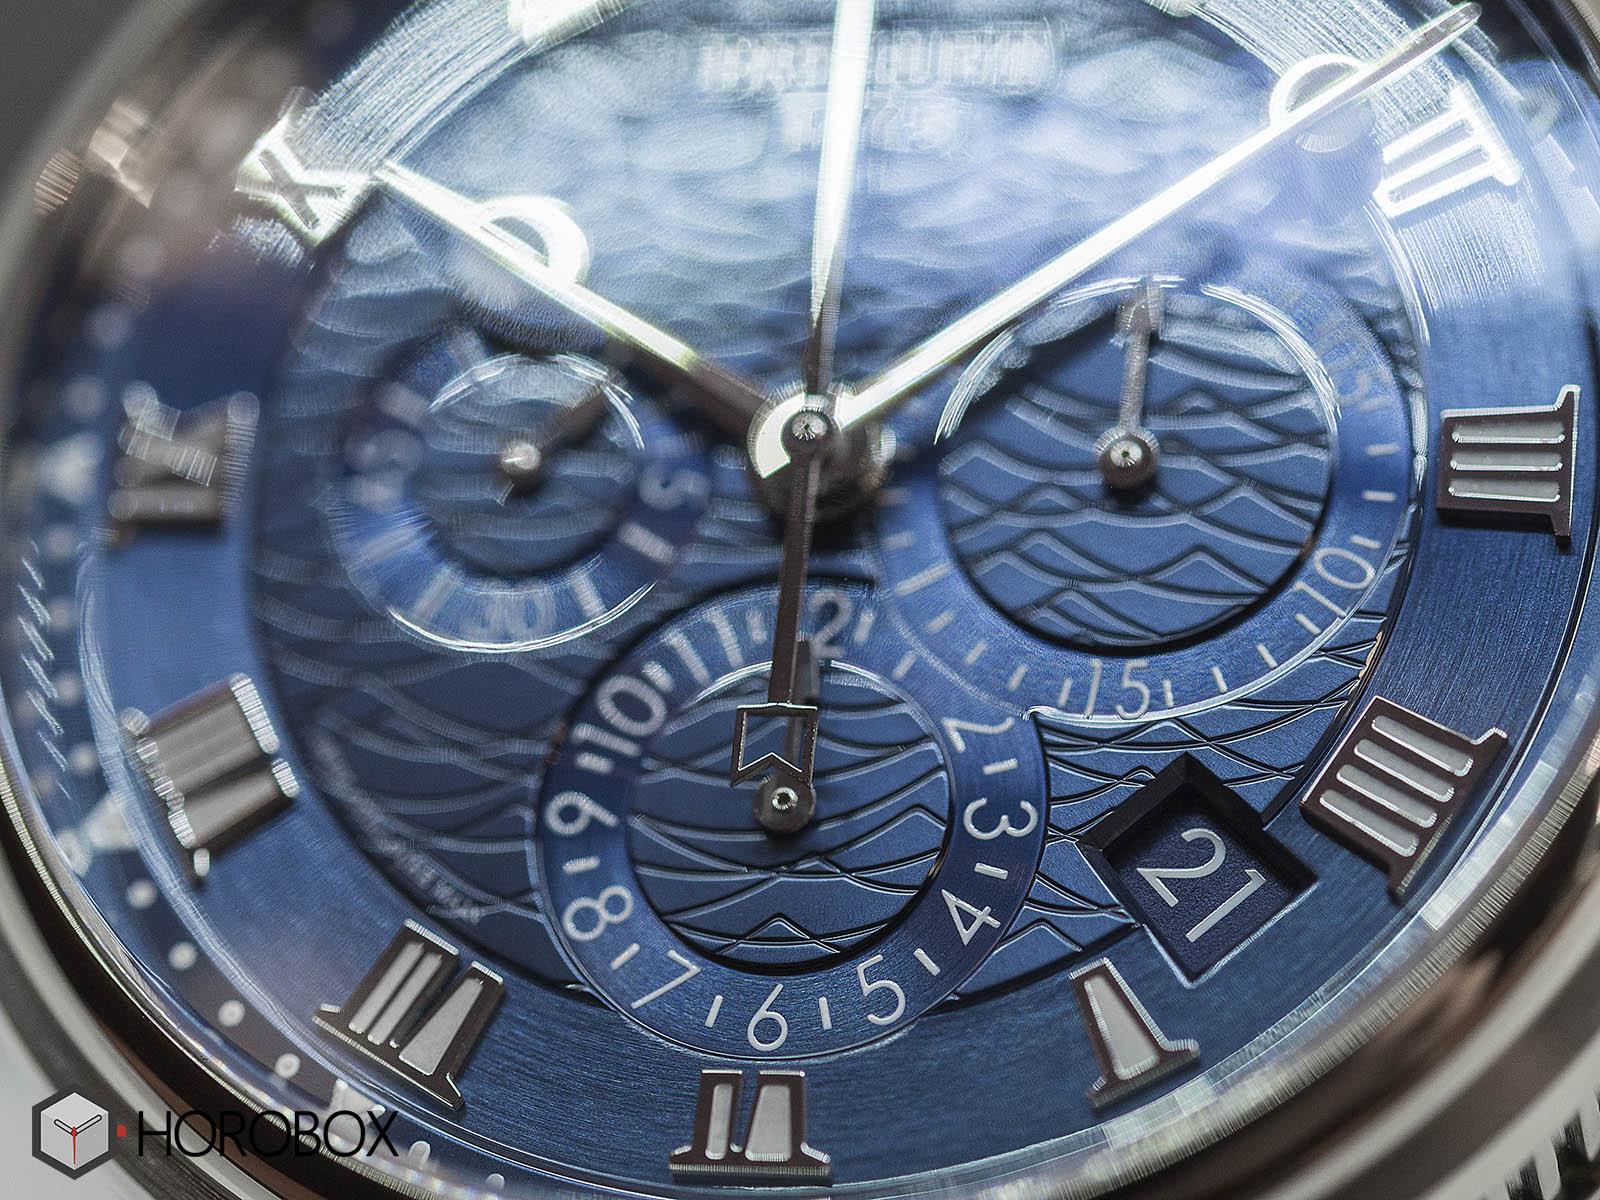 5527-breguet-marine-chronograph-2.jpg